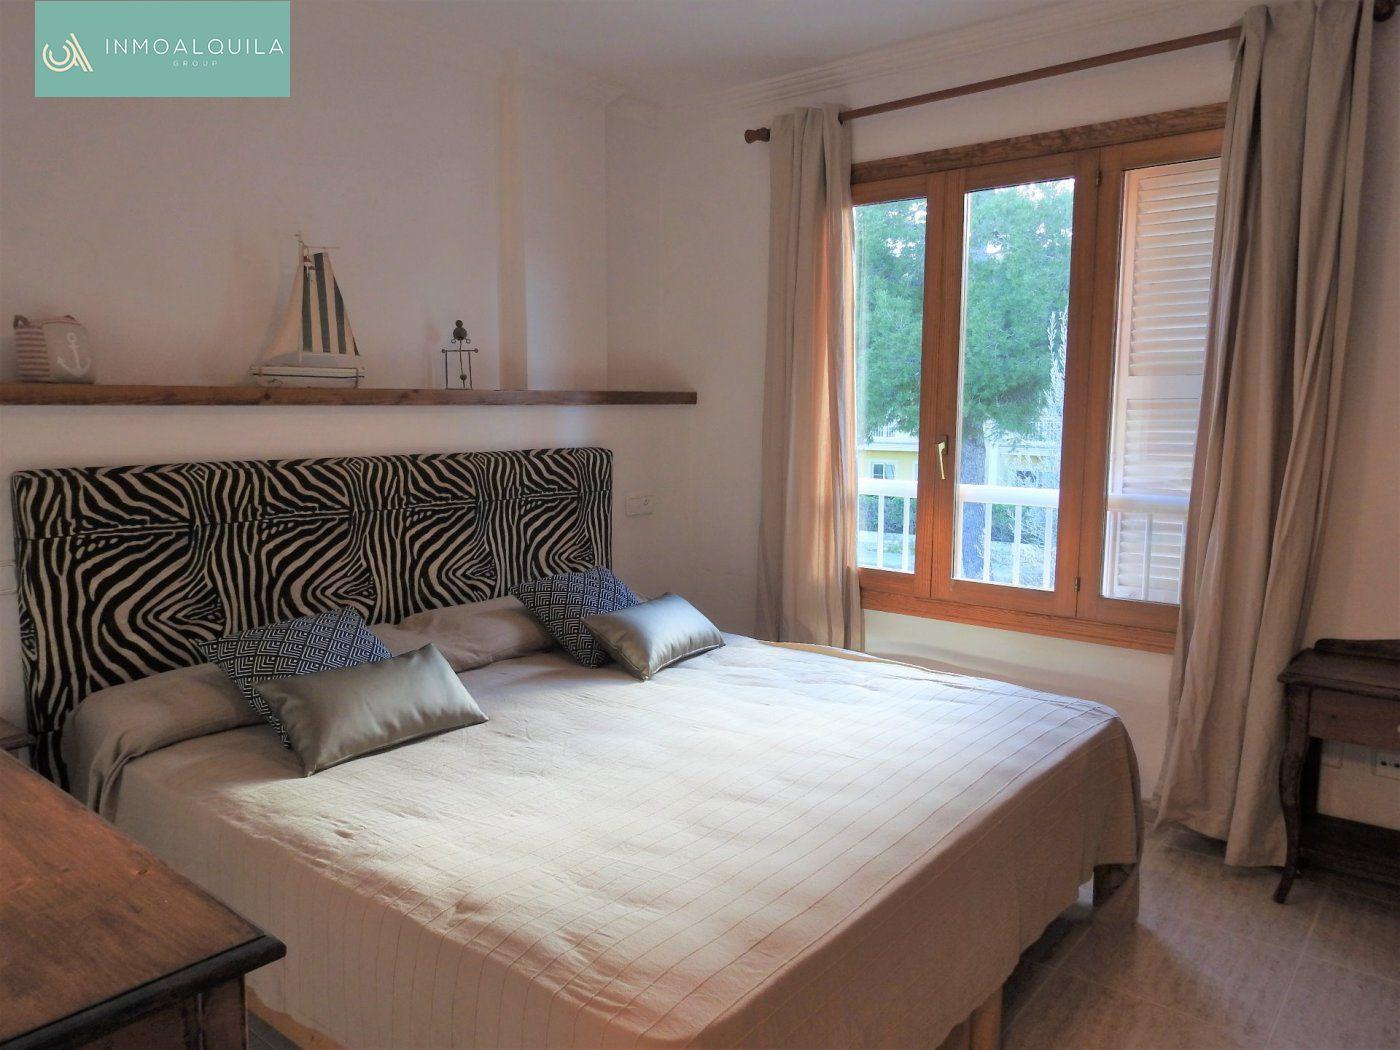 Rent House  Can picafort ,santa eulalia. Espectacular adosado en can picafort. 90m2, 3hab, 3baños, jardin